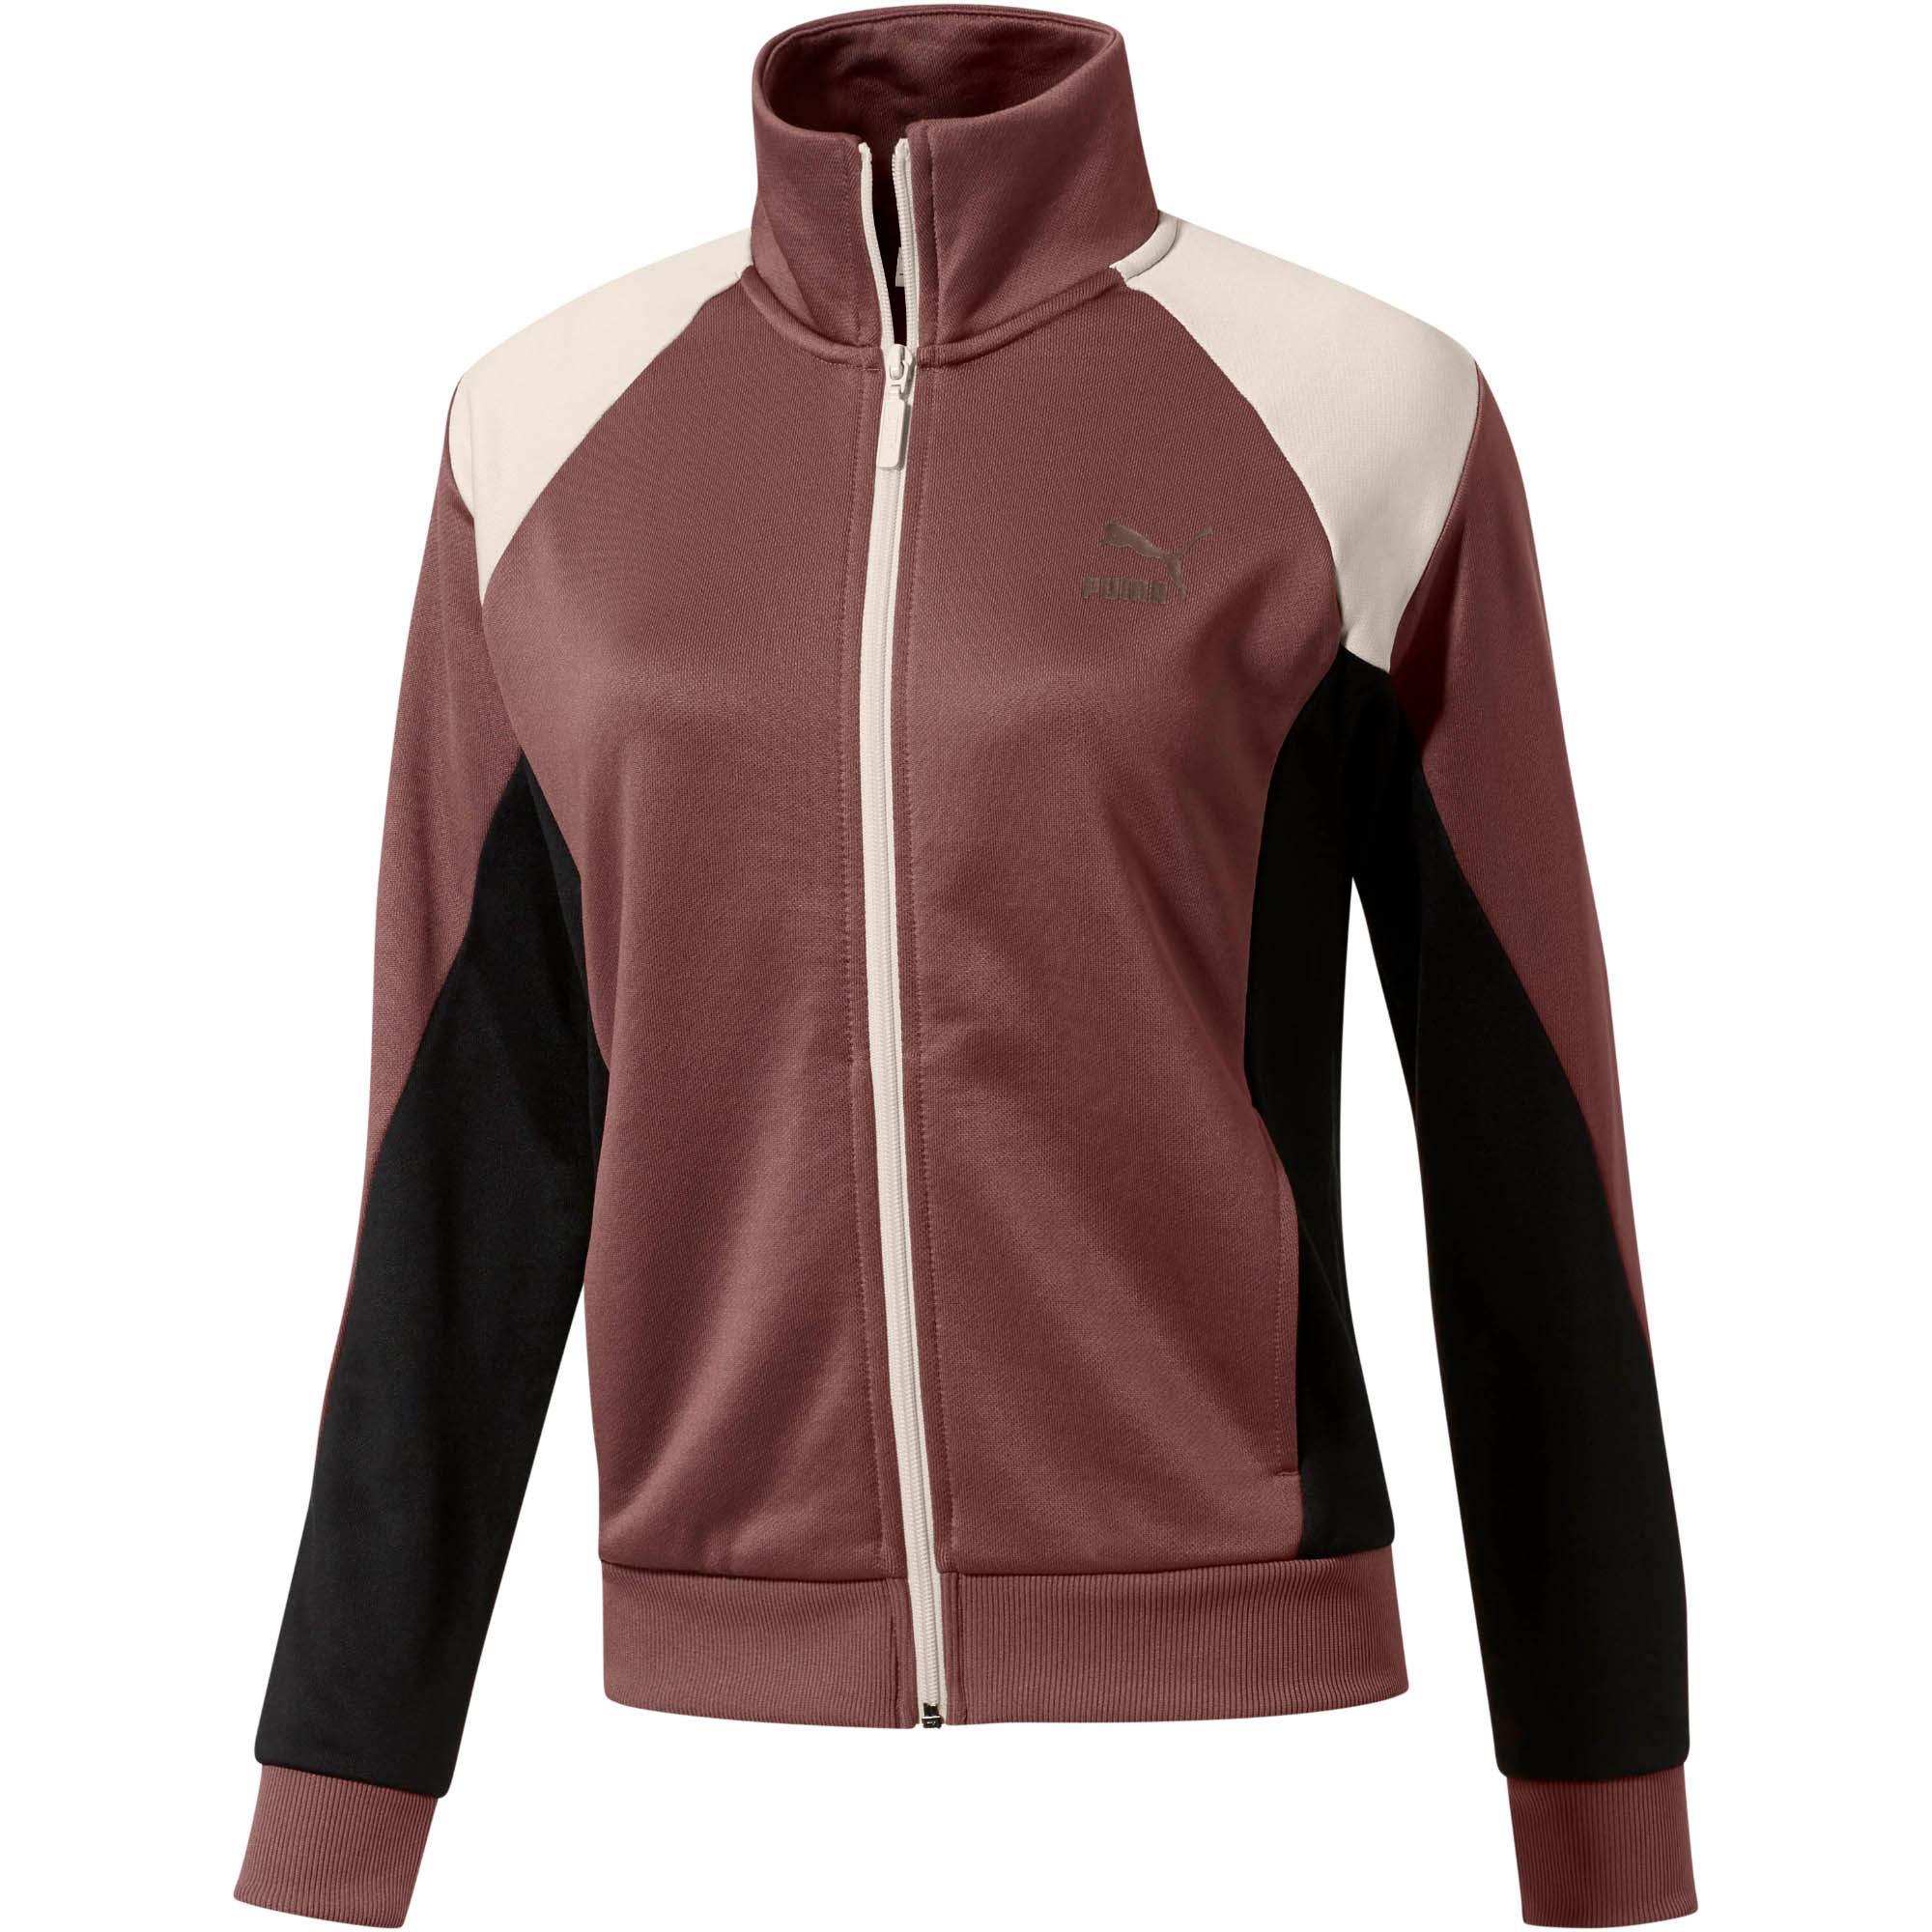 Womens Jacket Peppercorn M Track Größe Retro Puma vqwxtSpzSE